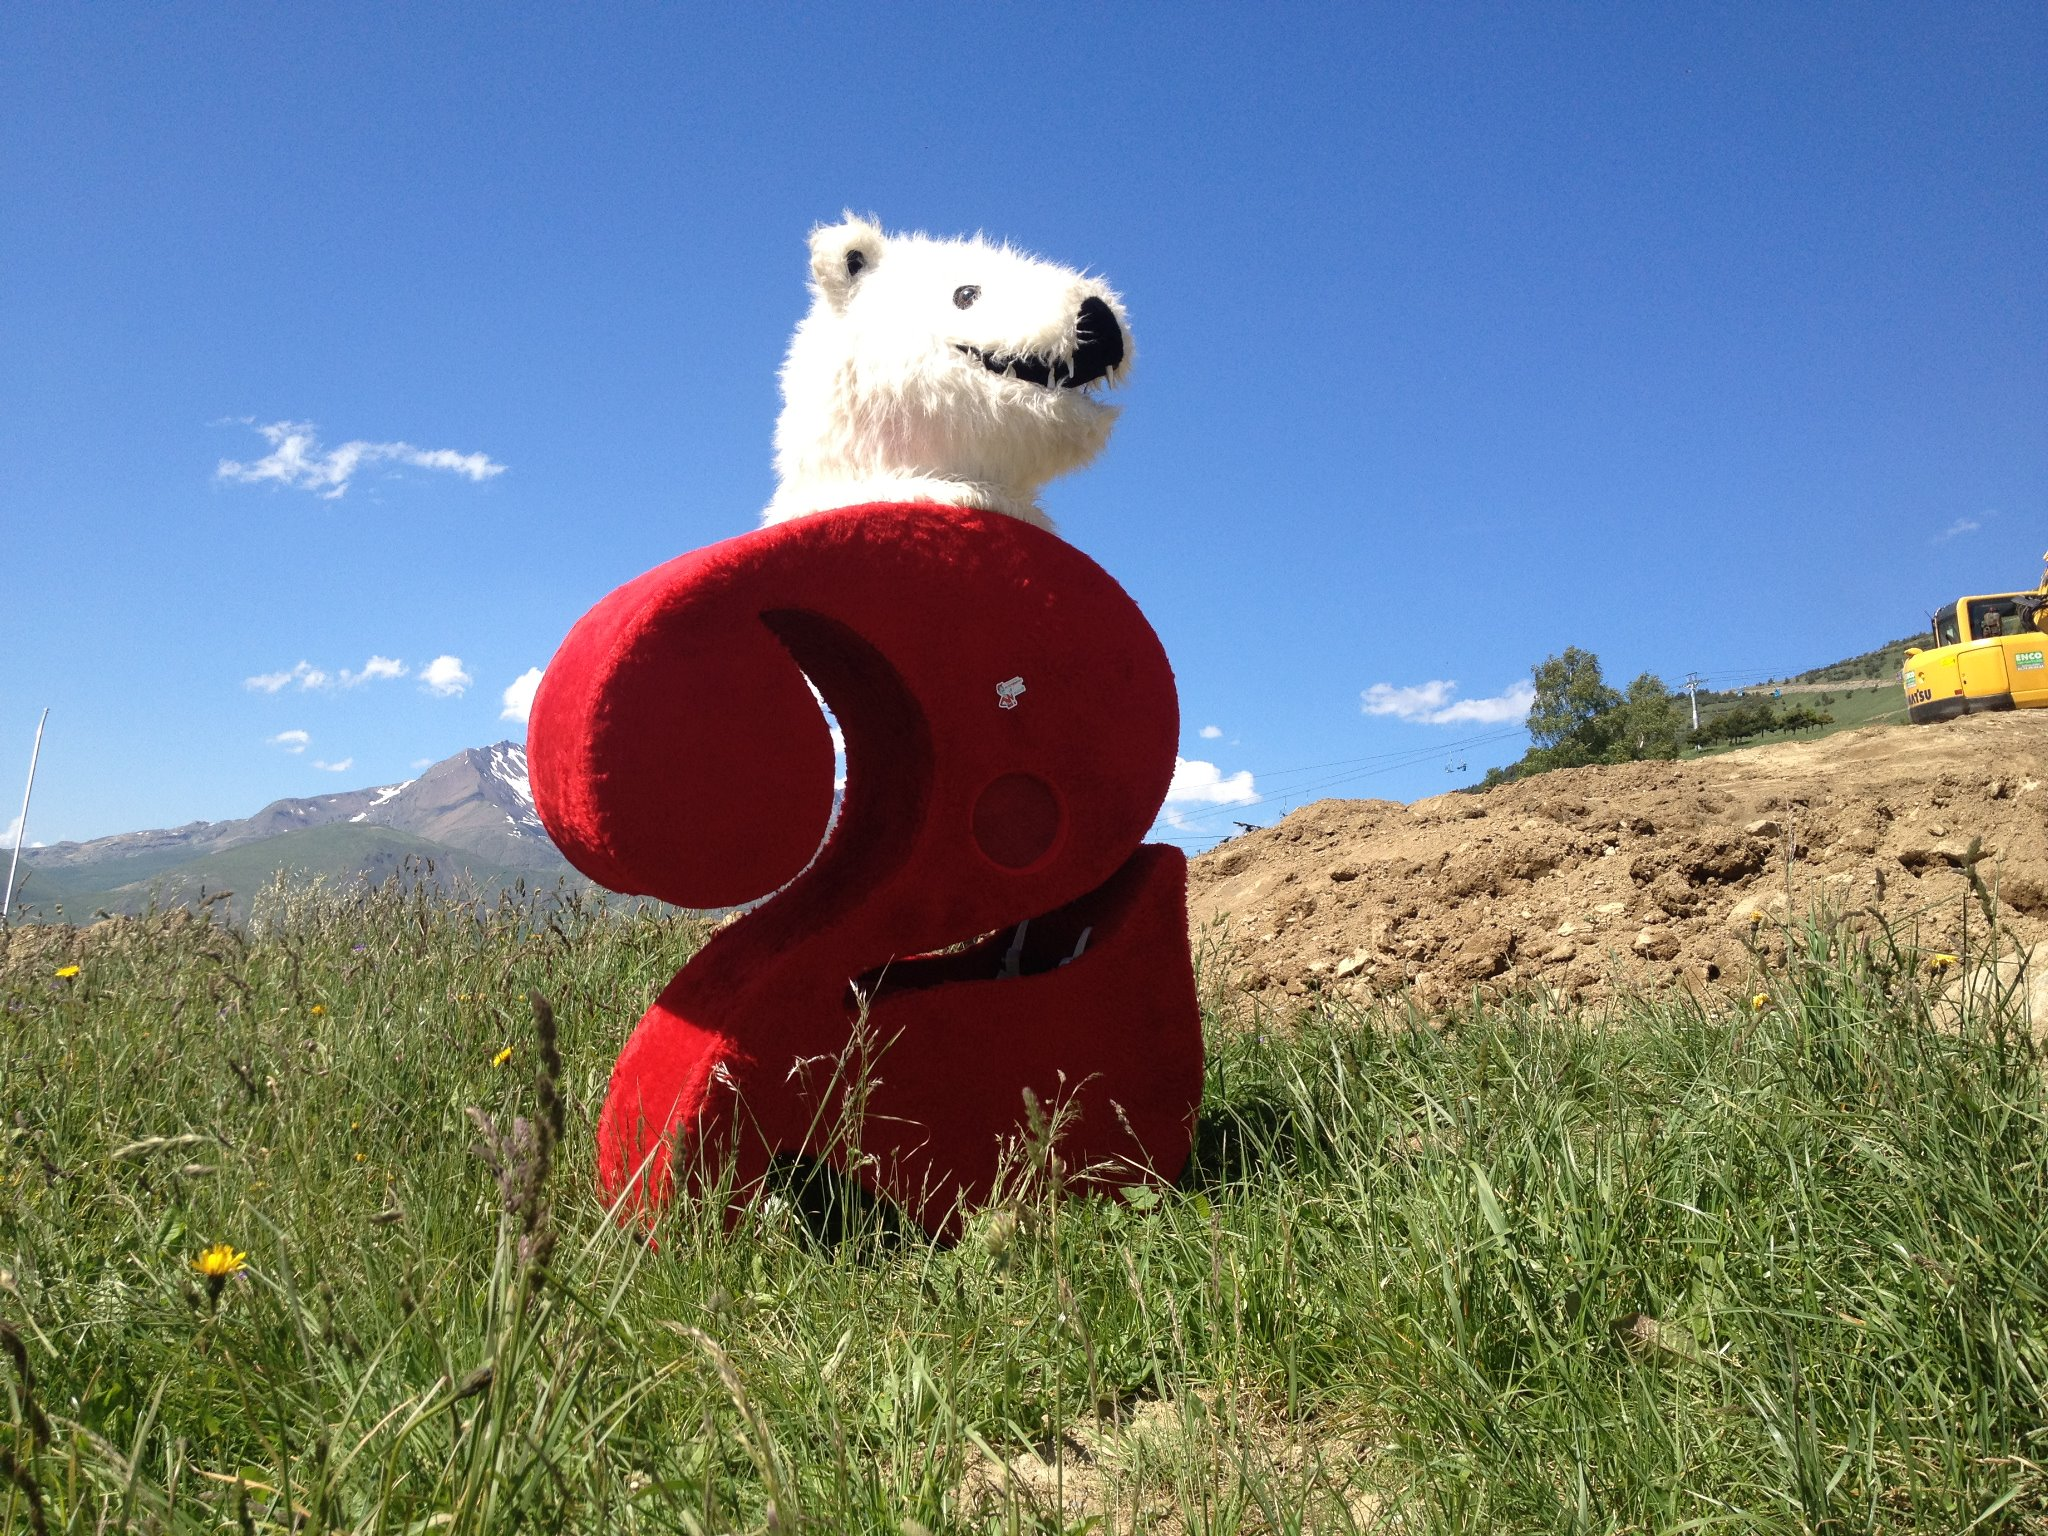 The bear gets everywhere....